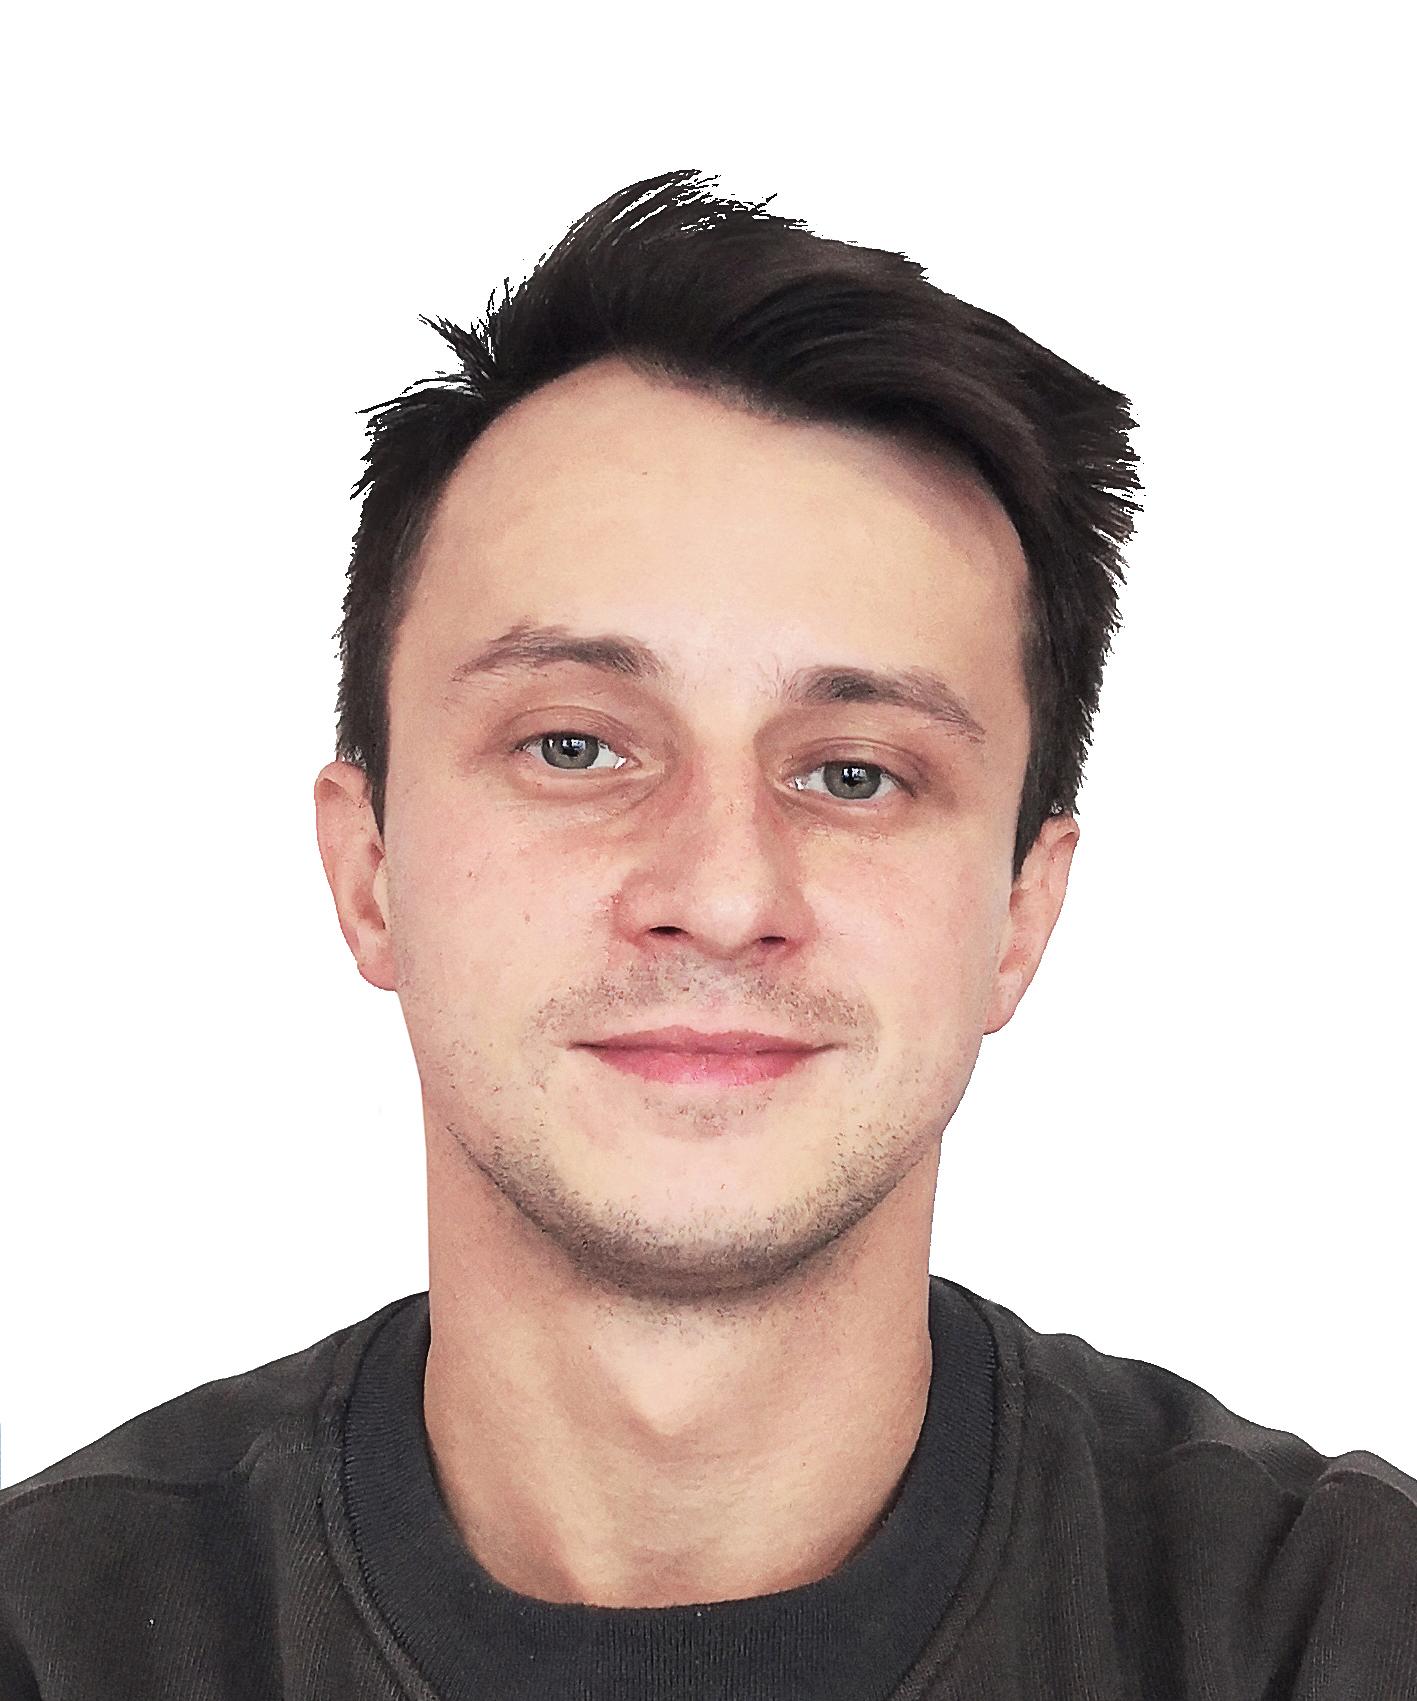 Pavel Danilov